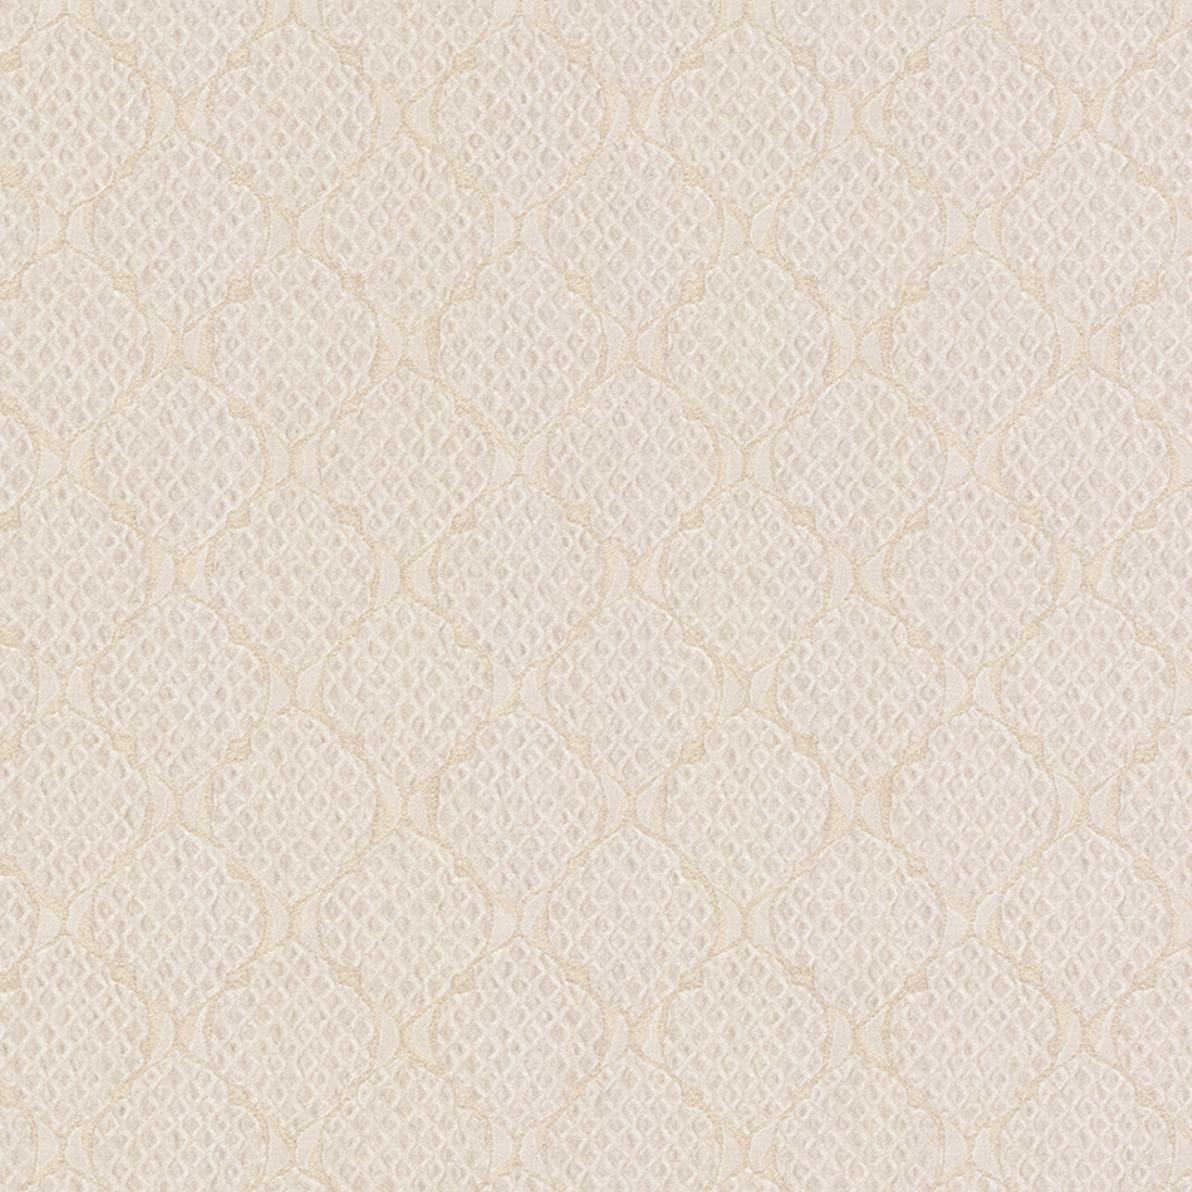 Обои Decori & Decori Bukhara 82796